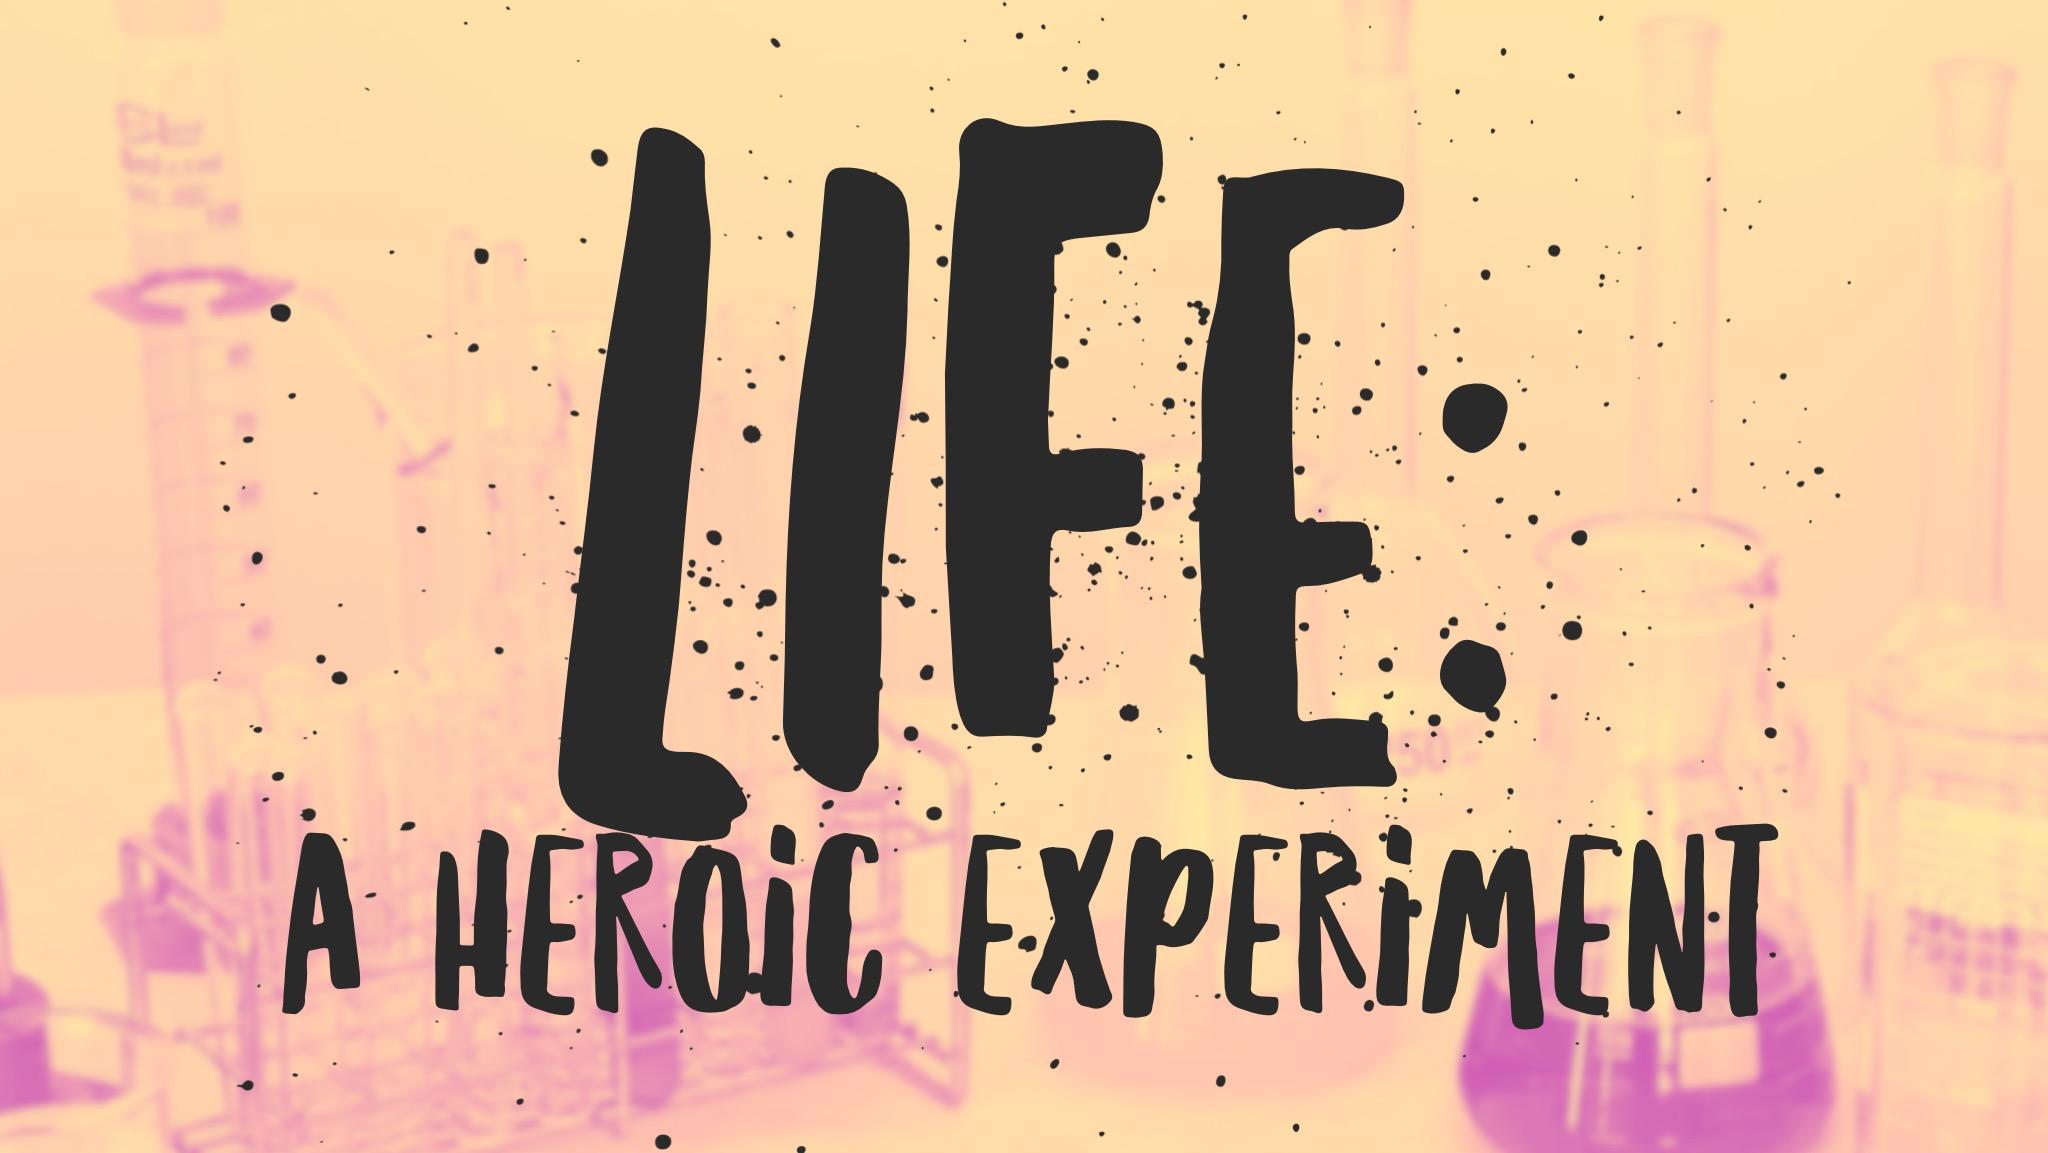 heroic experiment